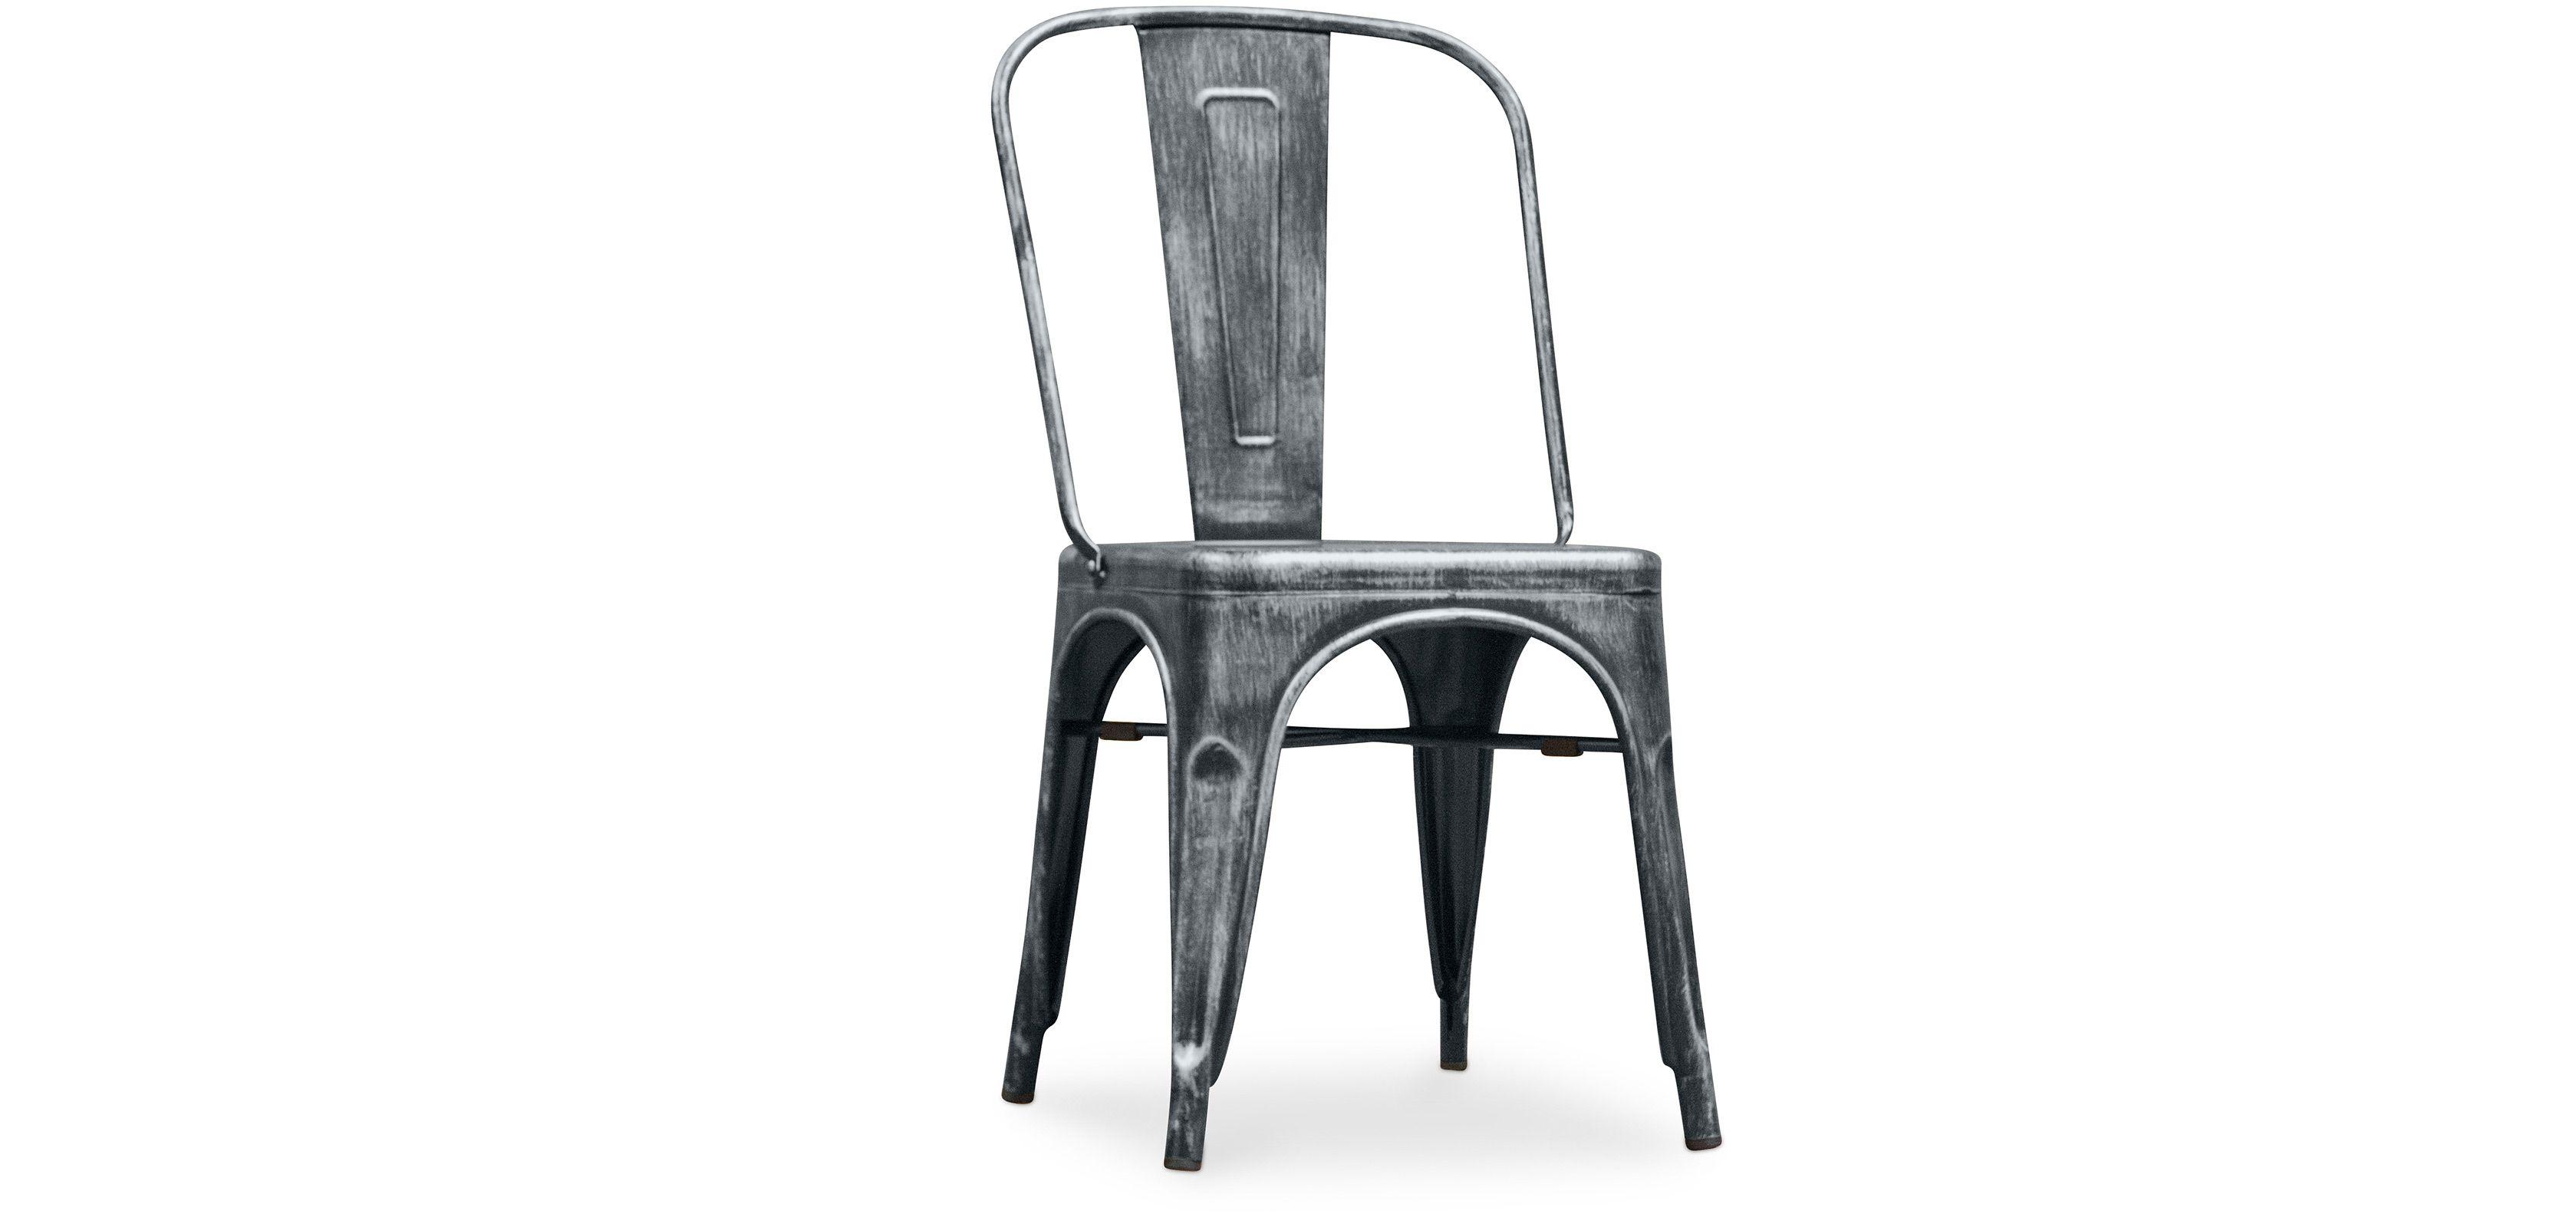 Tolix Chair Square Seat Xavier Pauchard Chaises Tolix Chaise